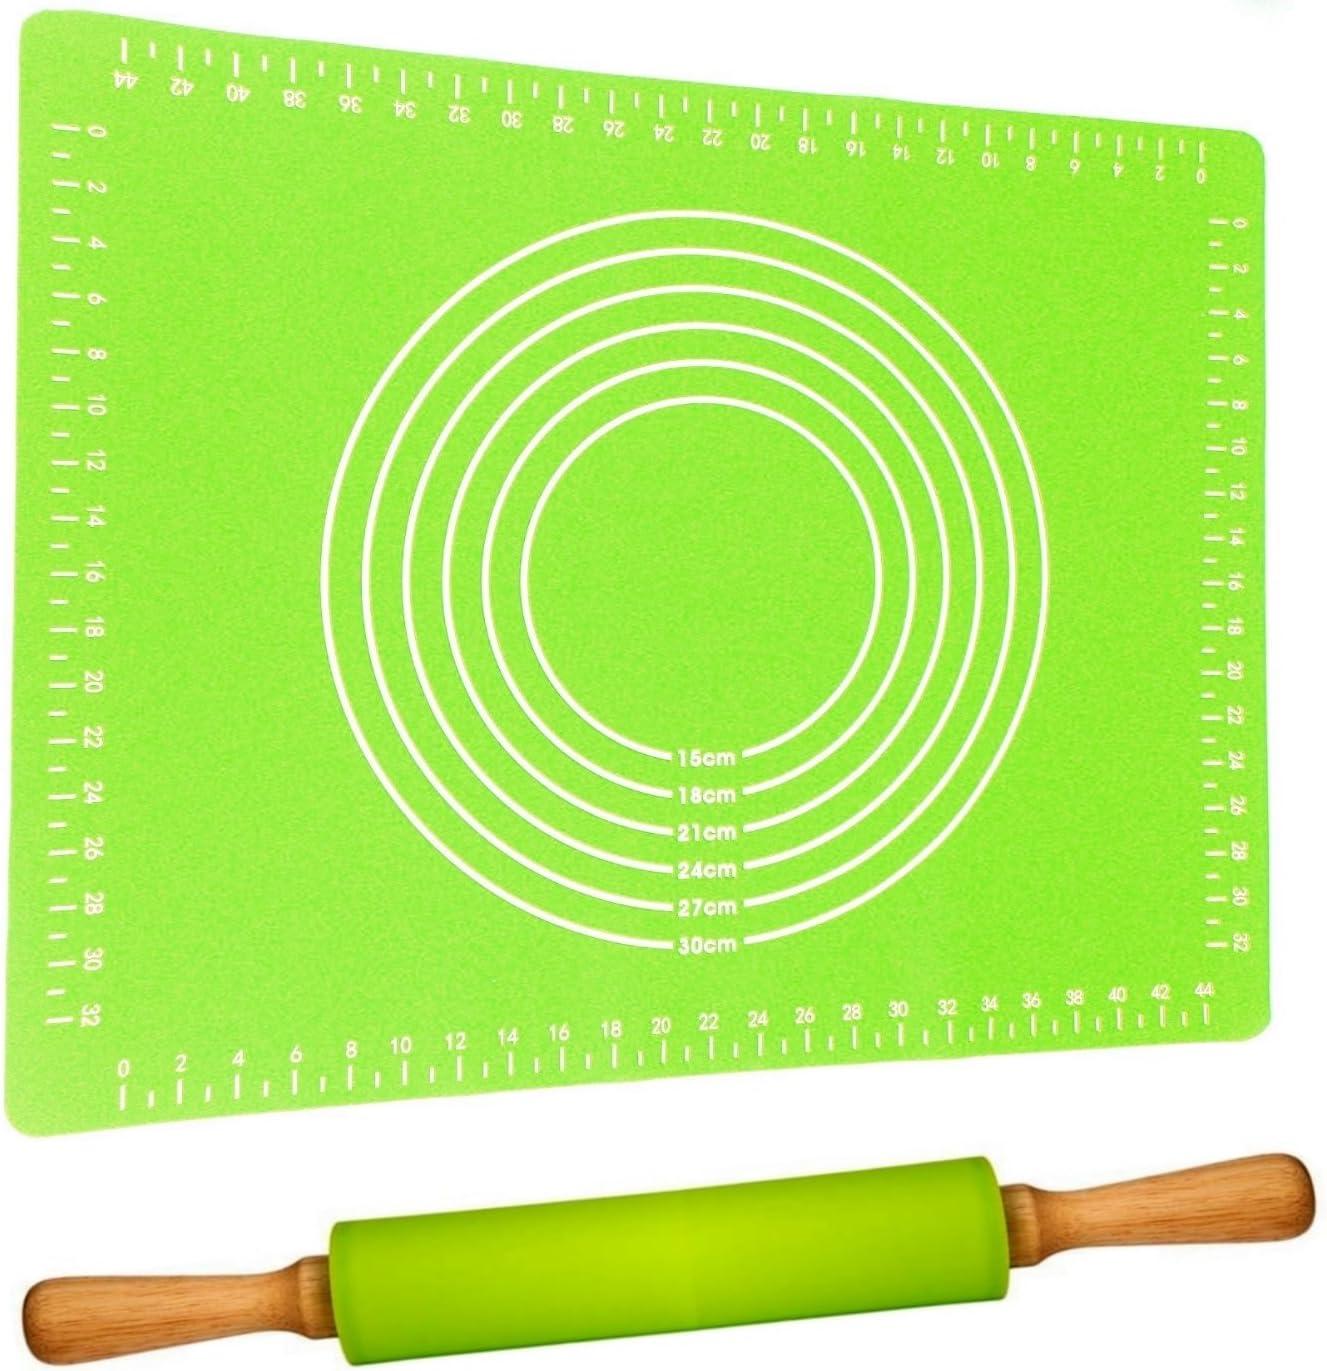 BPA frei Nudelholz 40cm mit Teigmatte 60x40cm Leichtes Ausrollen Antihaft Teigroller mit Backmatte Silikon Gro/ß Gr/ün